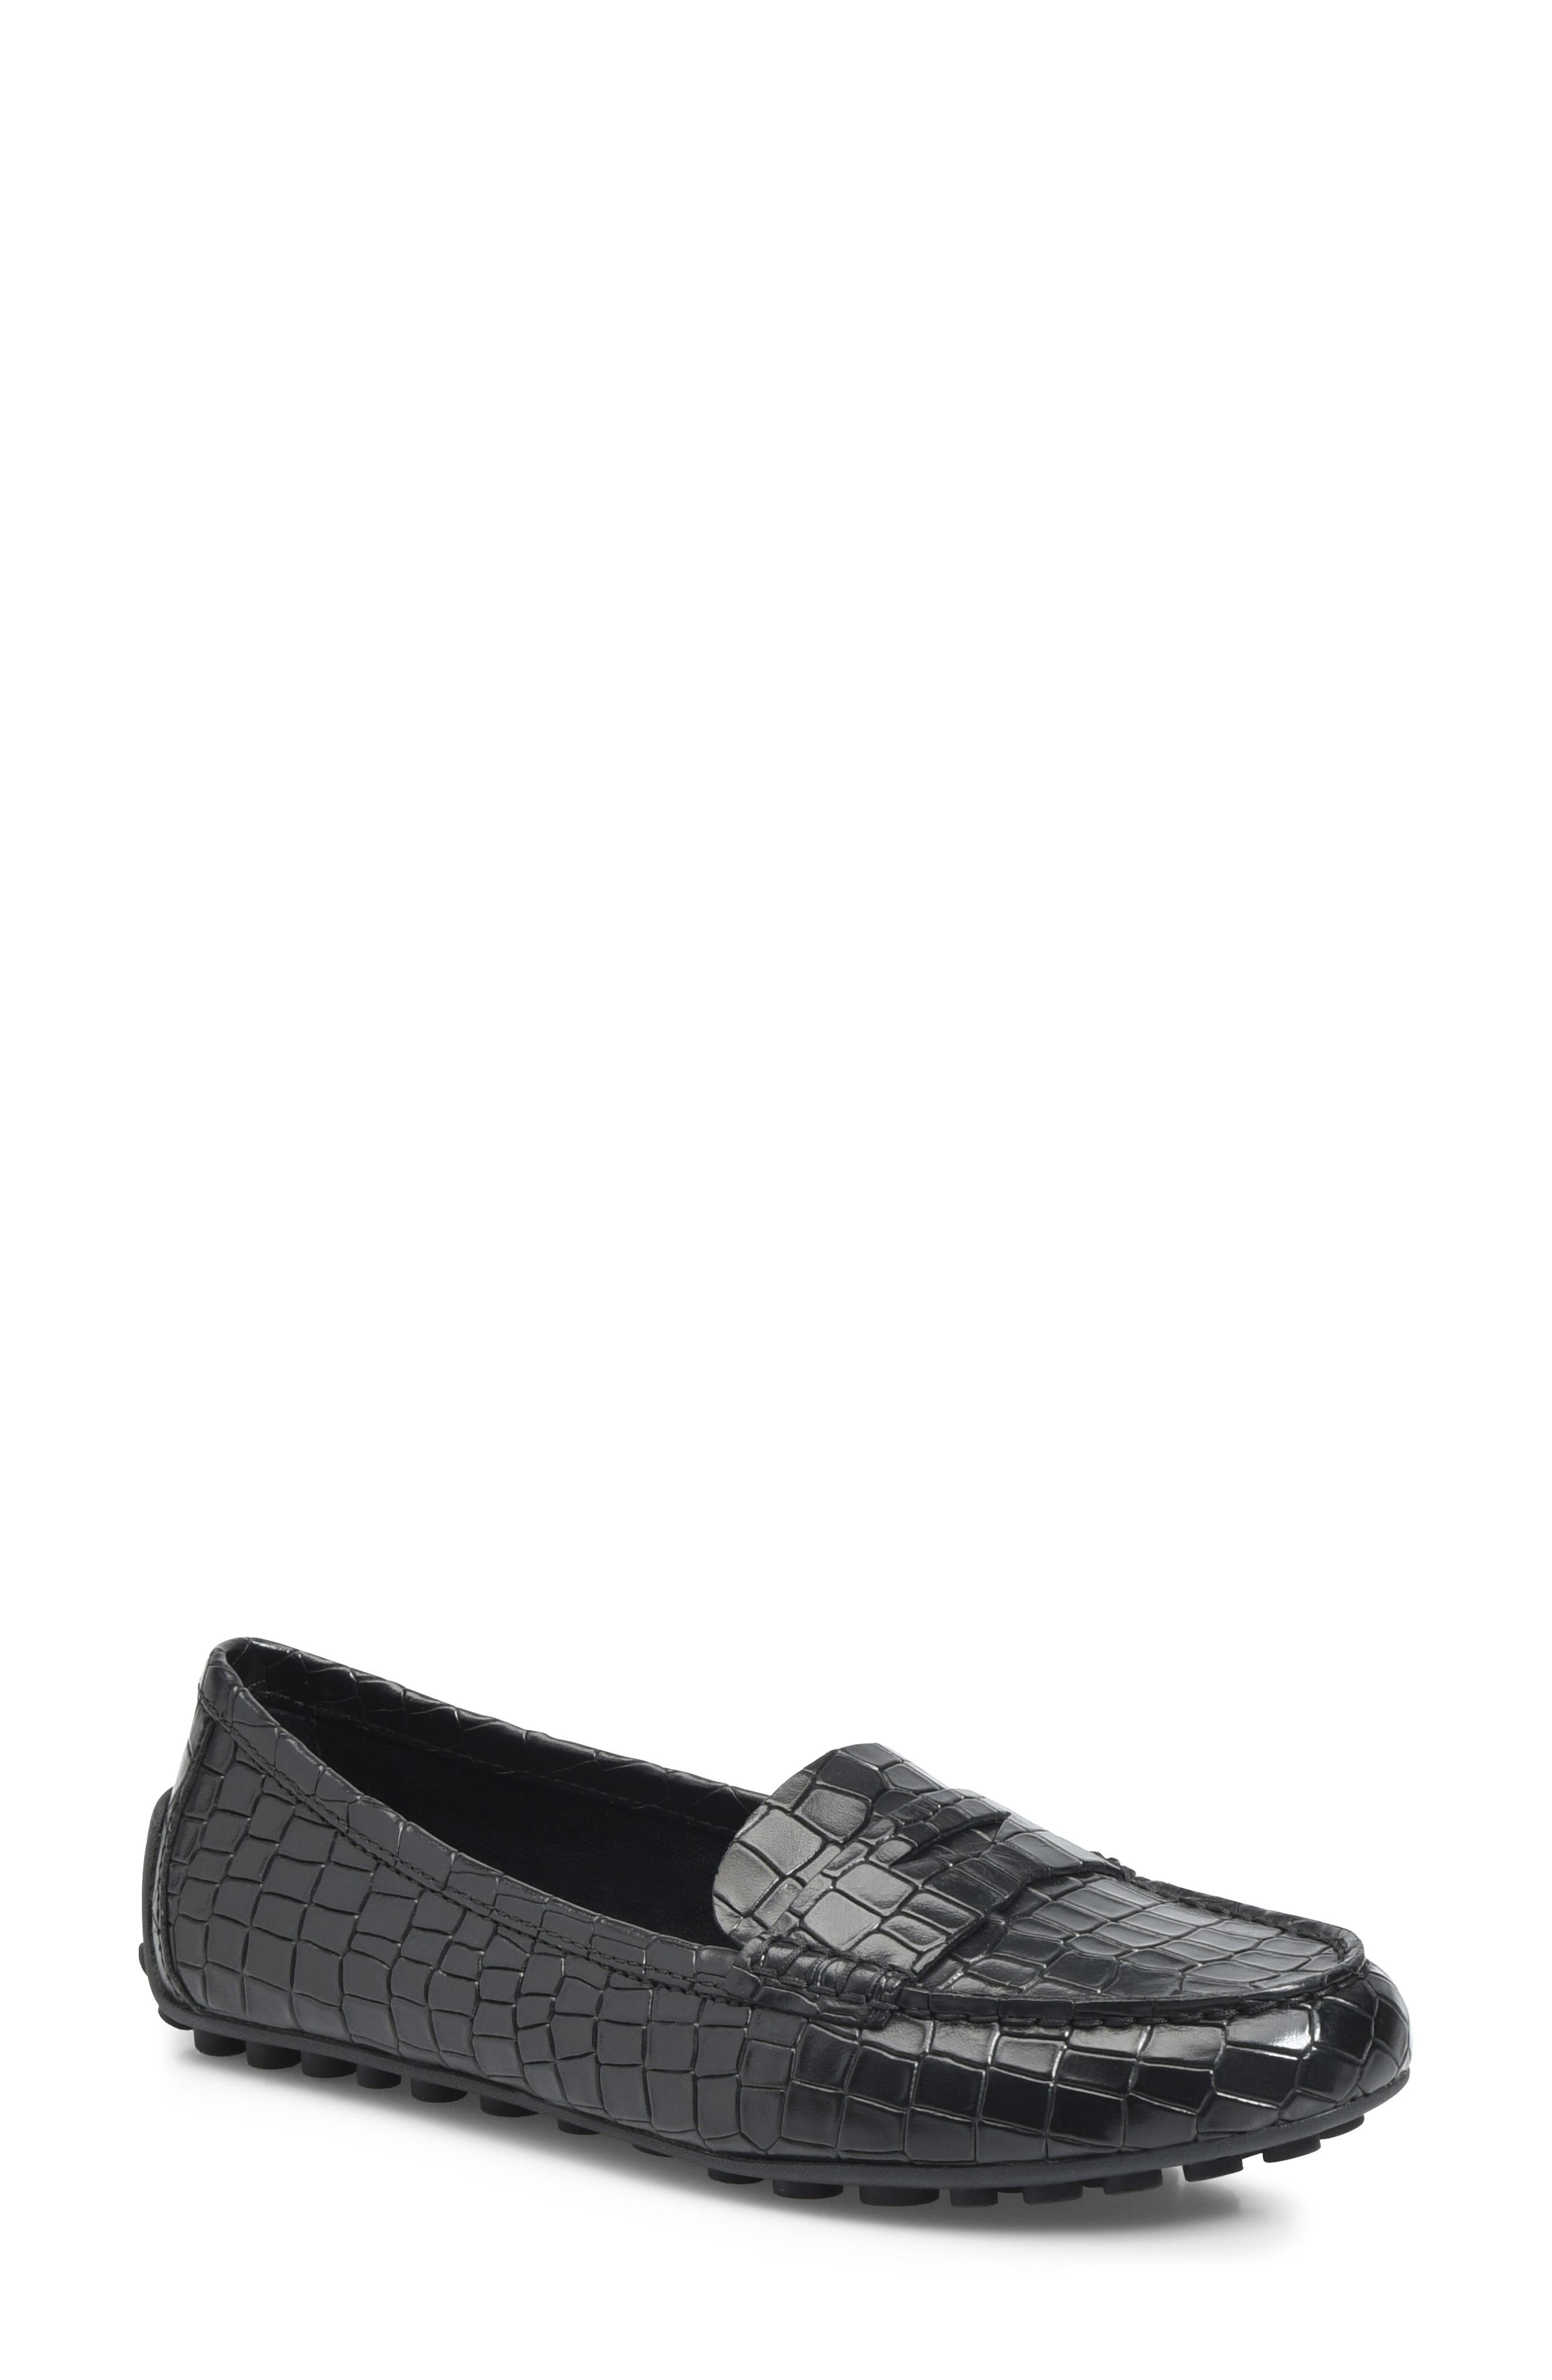 B?rn Malena Driving Loafer- Black